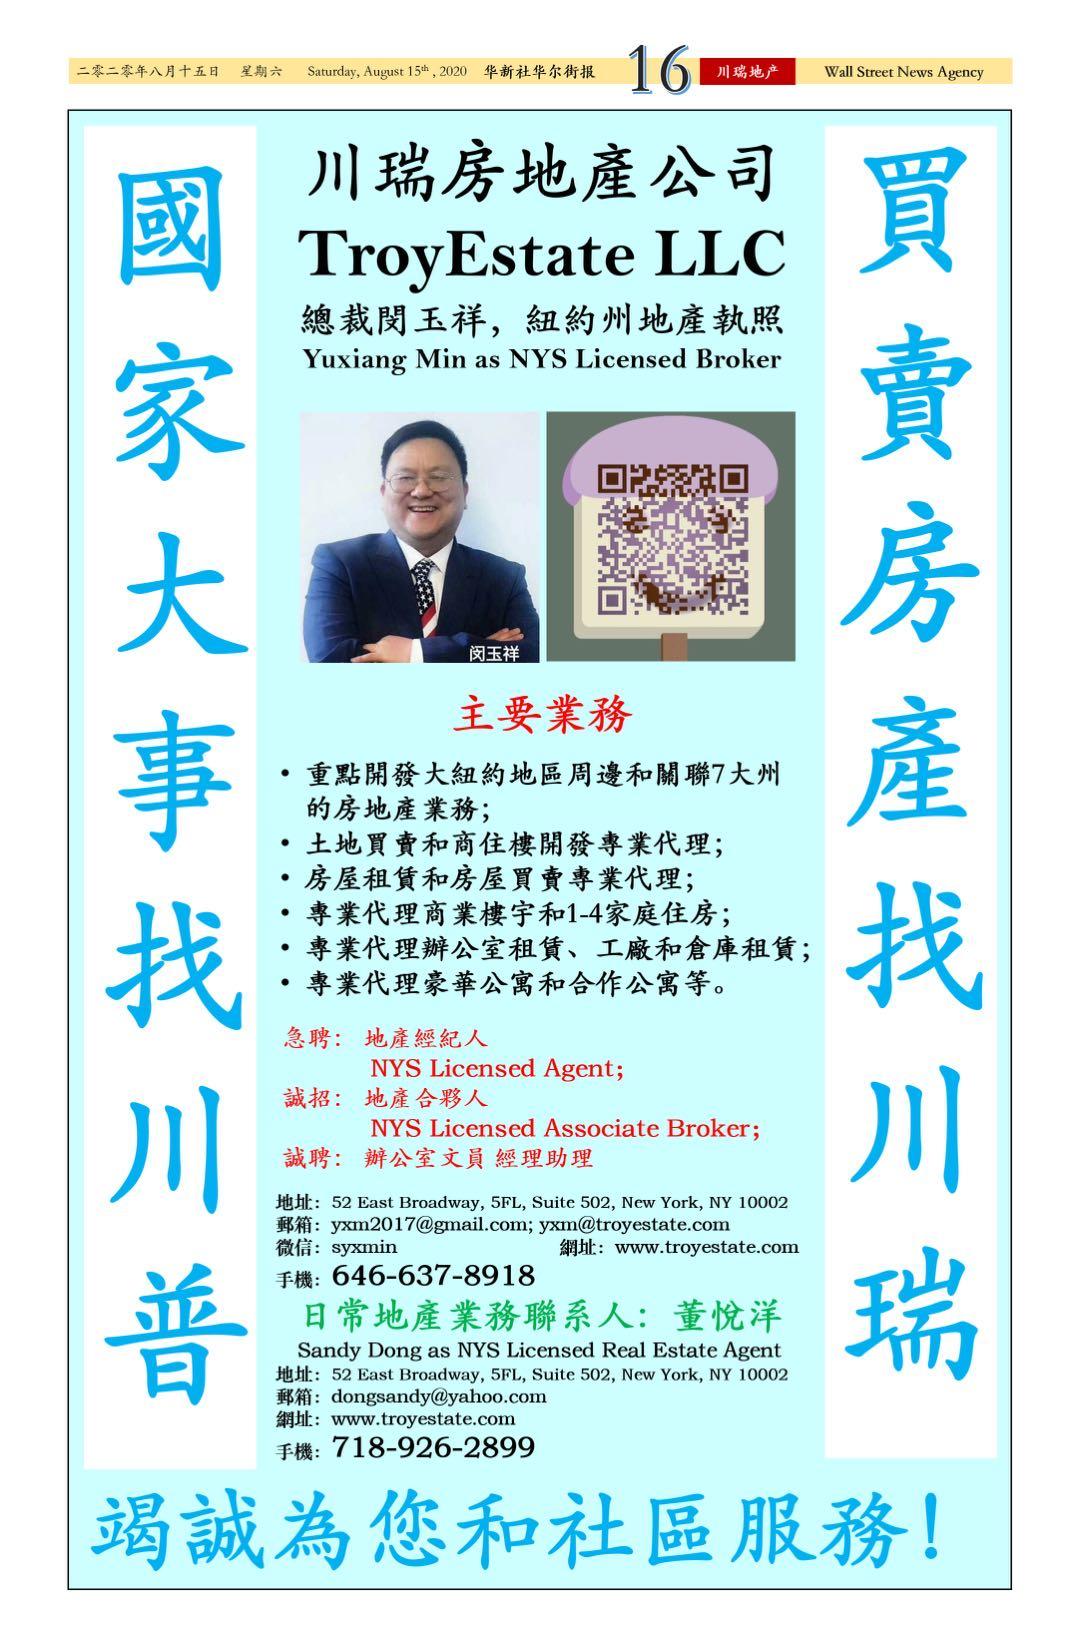 WeChat Image 20200901145820